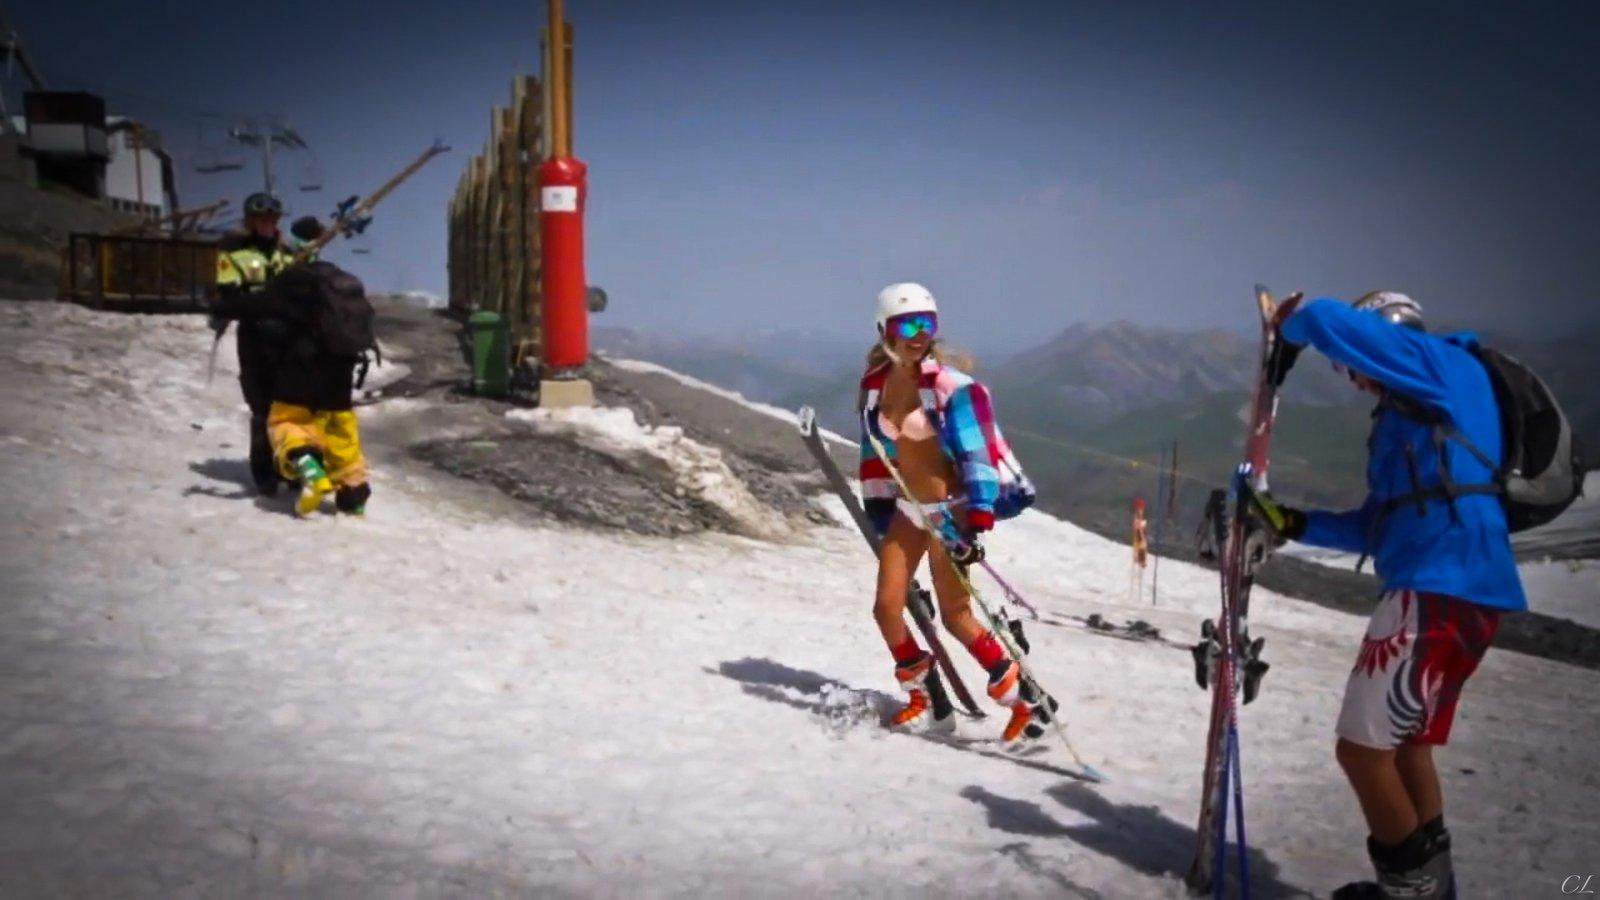 Summer Skiing in 2Alpes